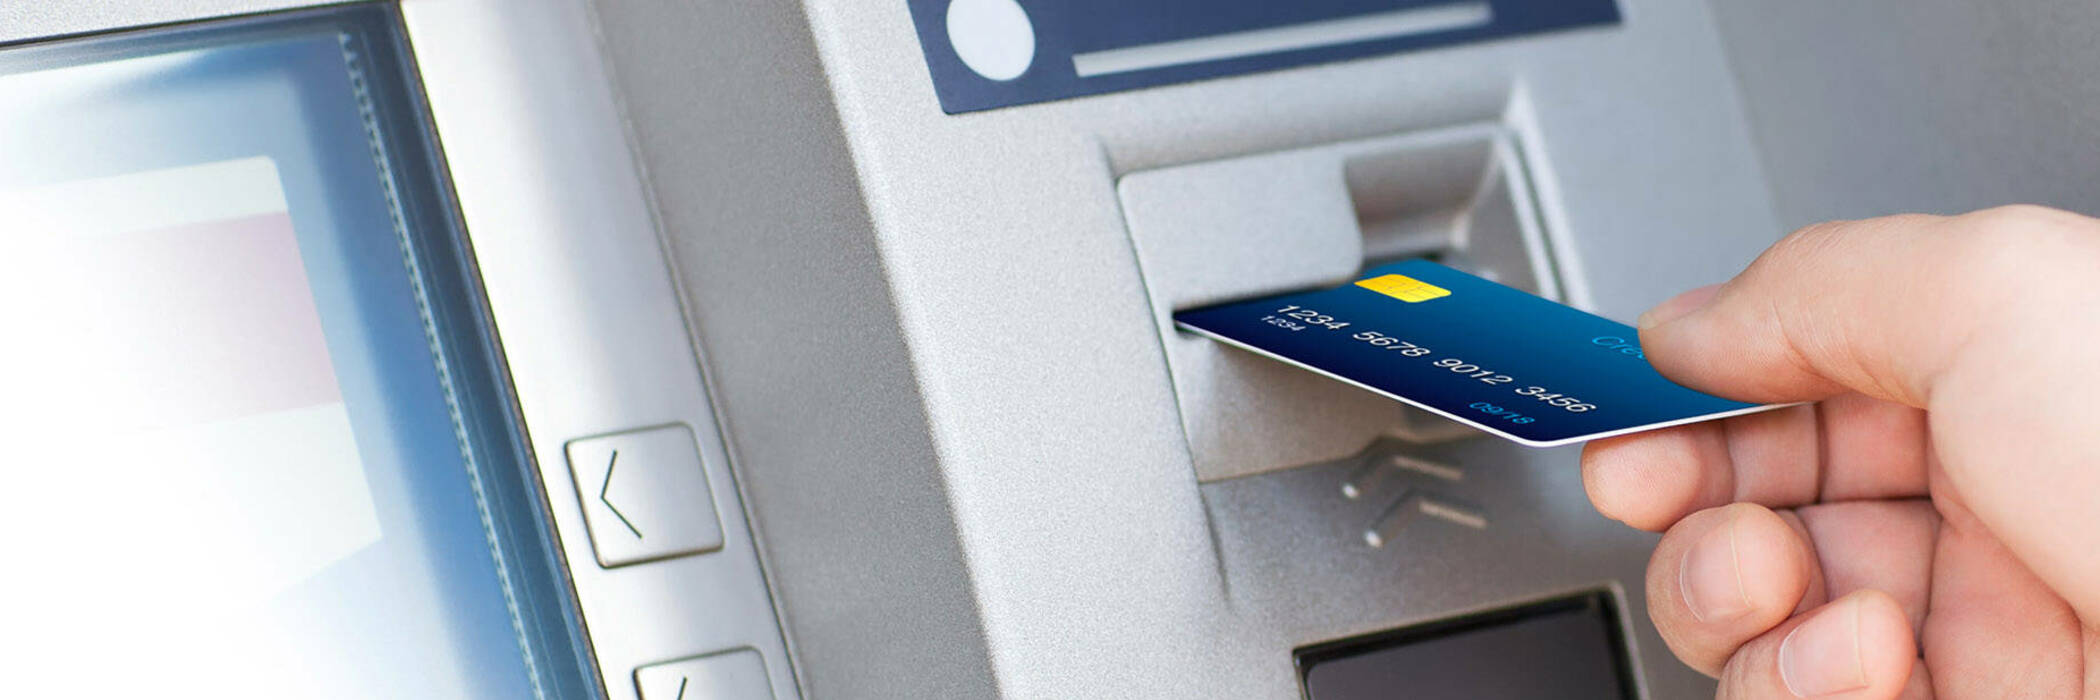 using ATM machine